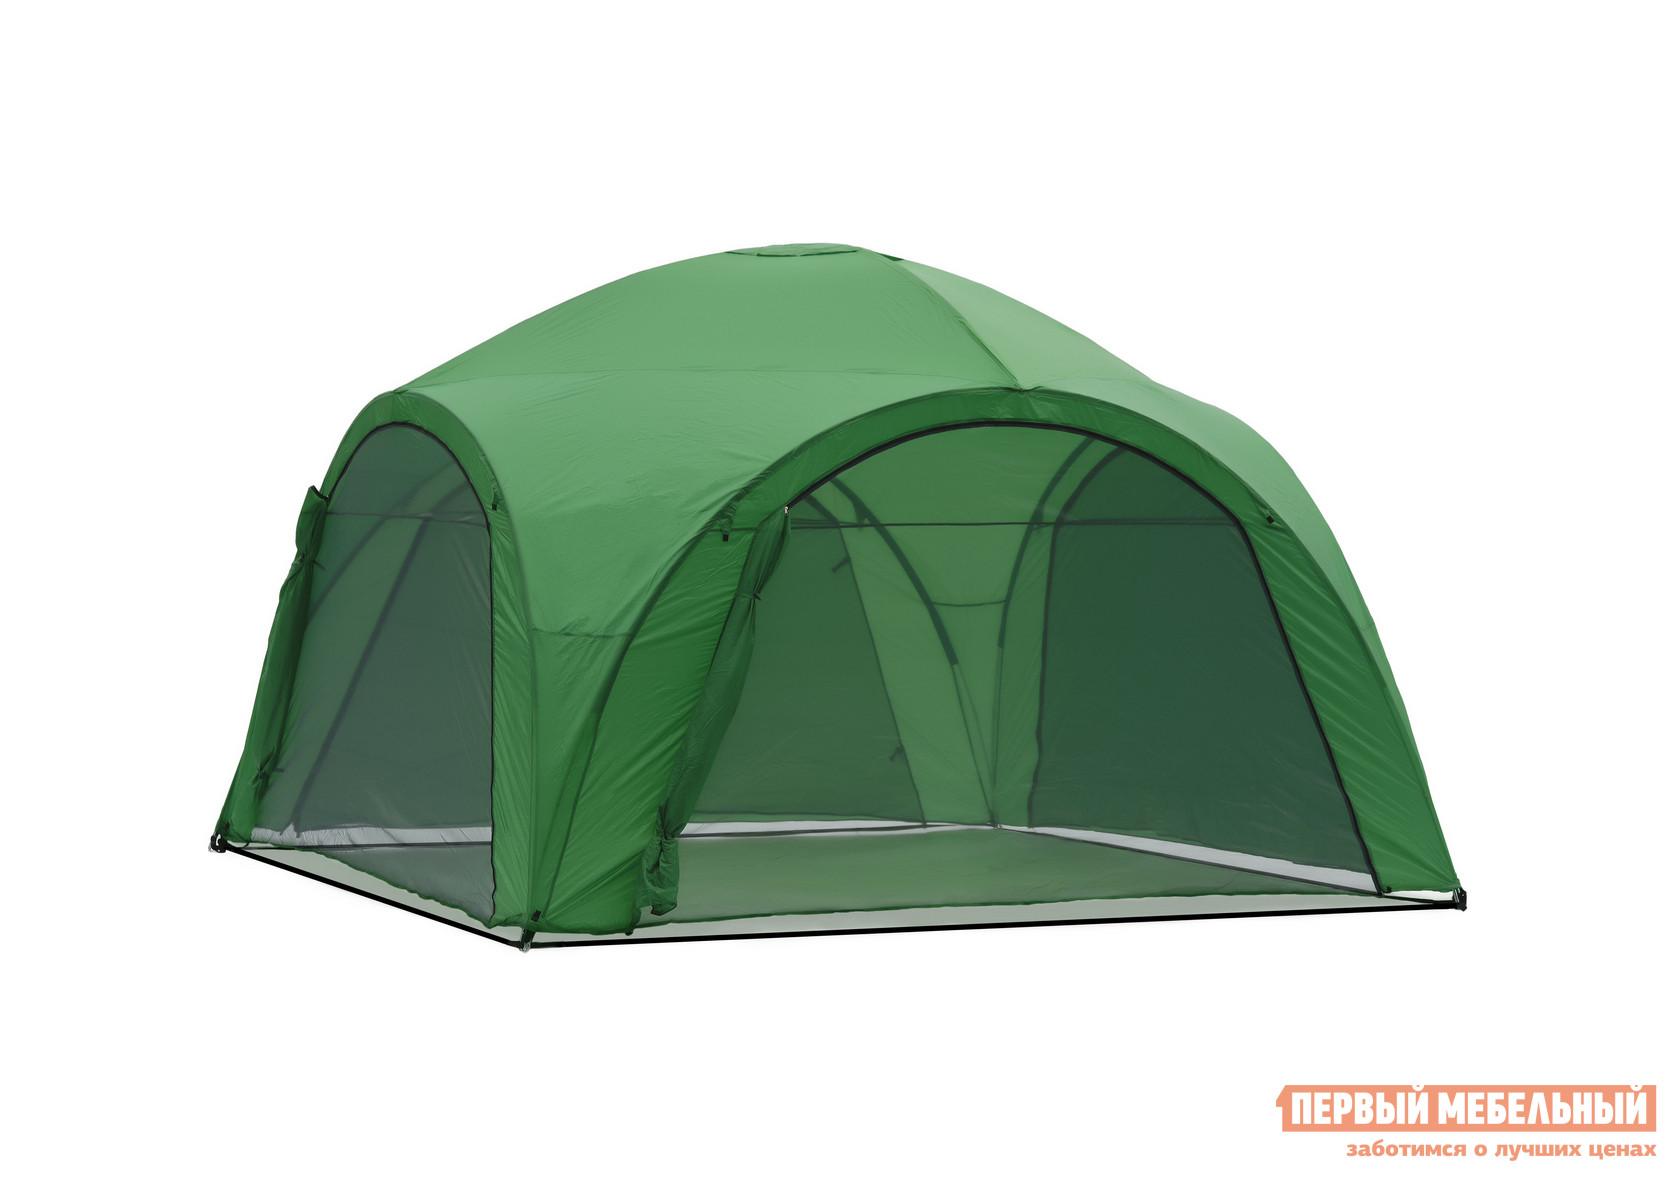 Шатер для дачи Лекс групп Green Glade 1264 шатер green glade 1053